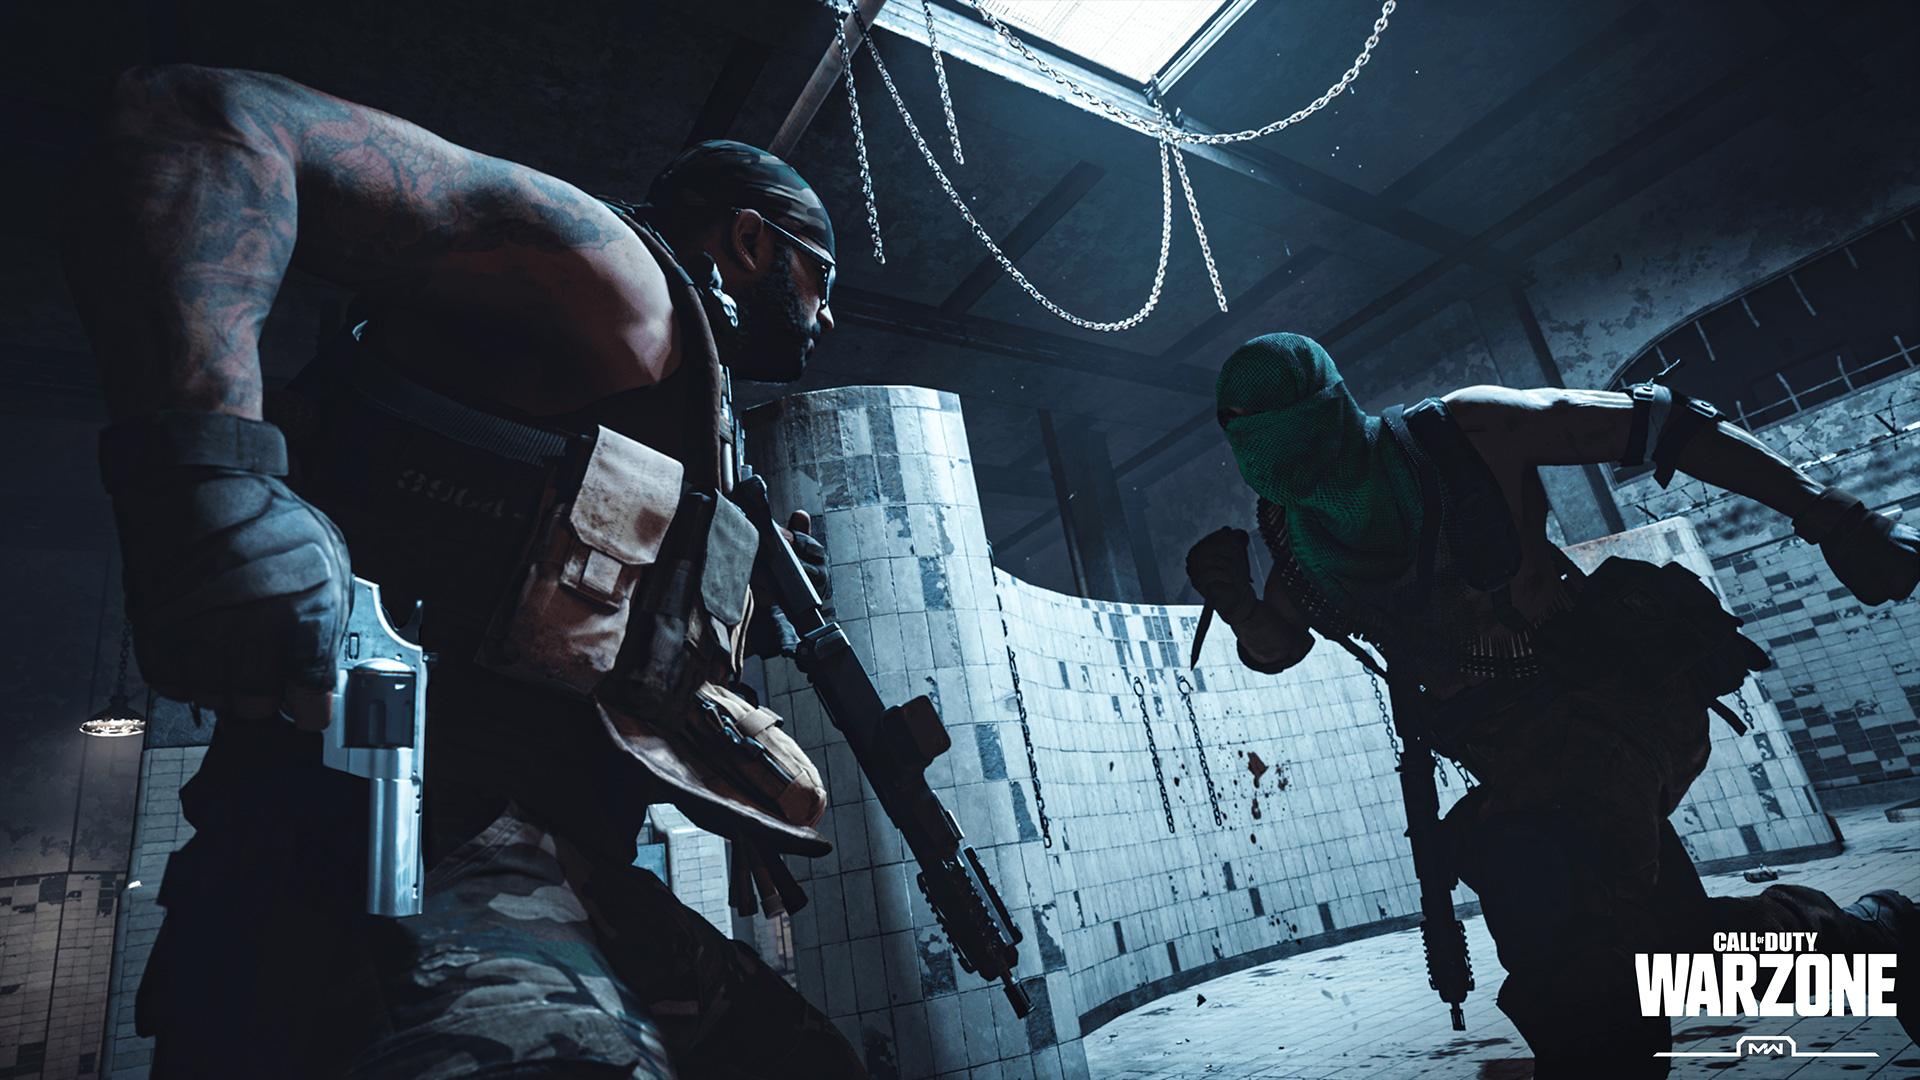 Comment courir plus vite dans Call of Duty Warzone